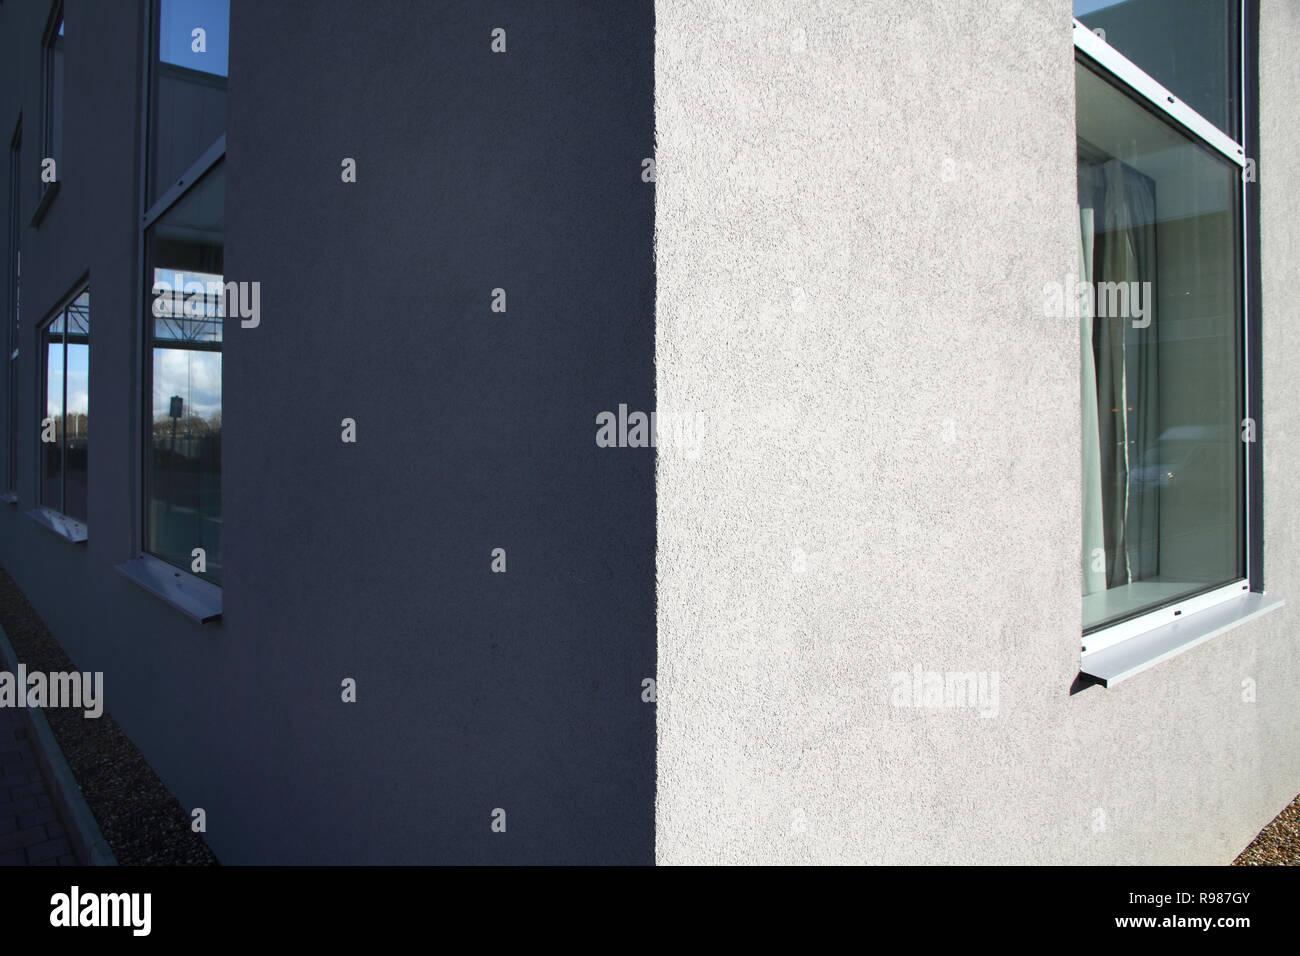 The Hilton Hampton Hotel, London Gatwick Airport, Using Weber exterior render - Stock Image